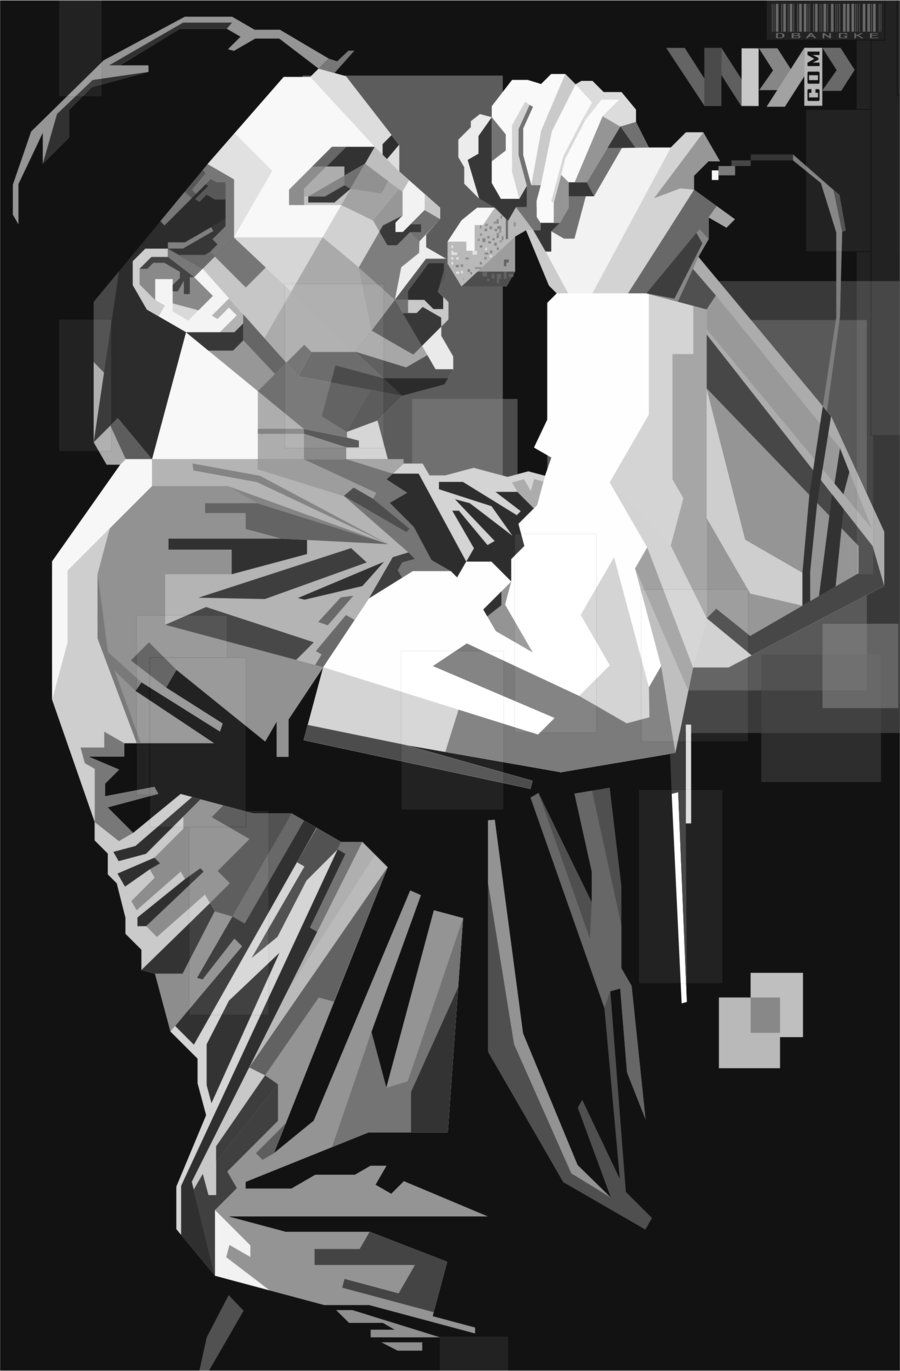 Eddie Vedder By Dbangke D5ajov9 Jpg 900 1371 Posteres De Rock Poster Musica Rock